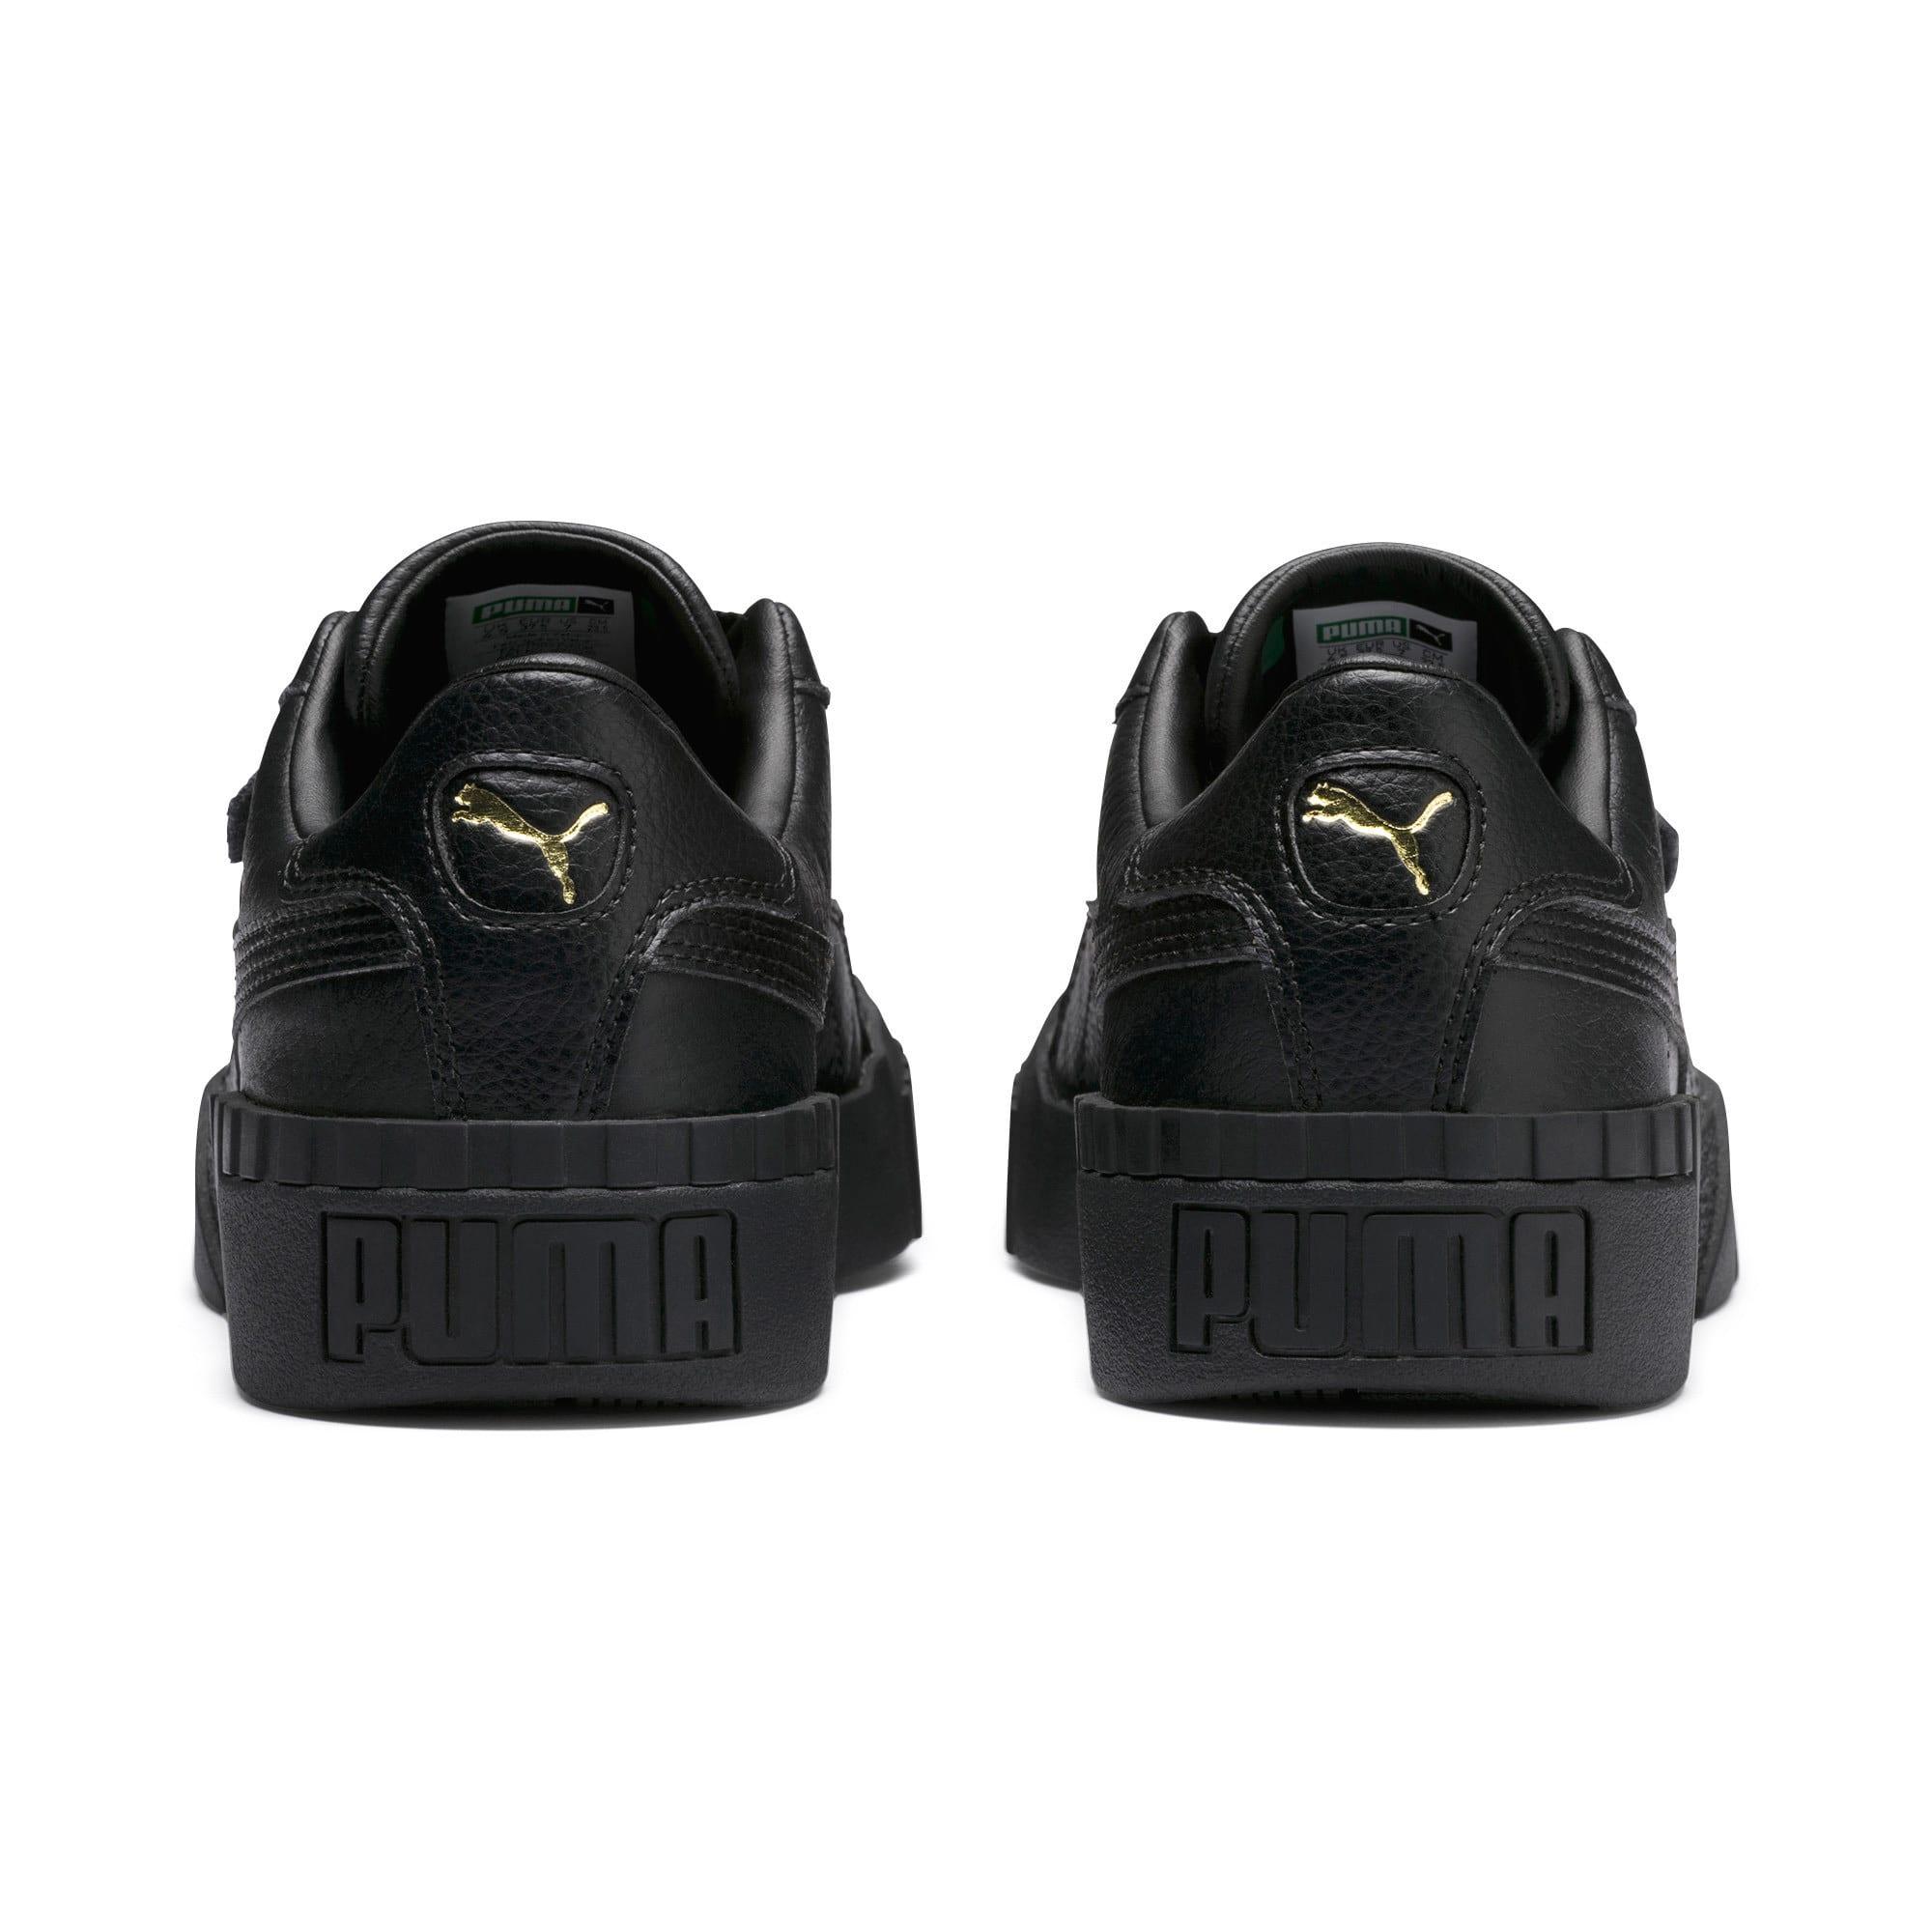 Thumbnail 4 of Sneakers Cali donna, Puma Black-Puma Black, medium